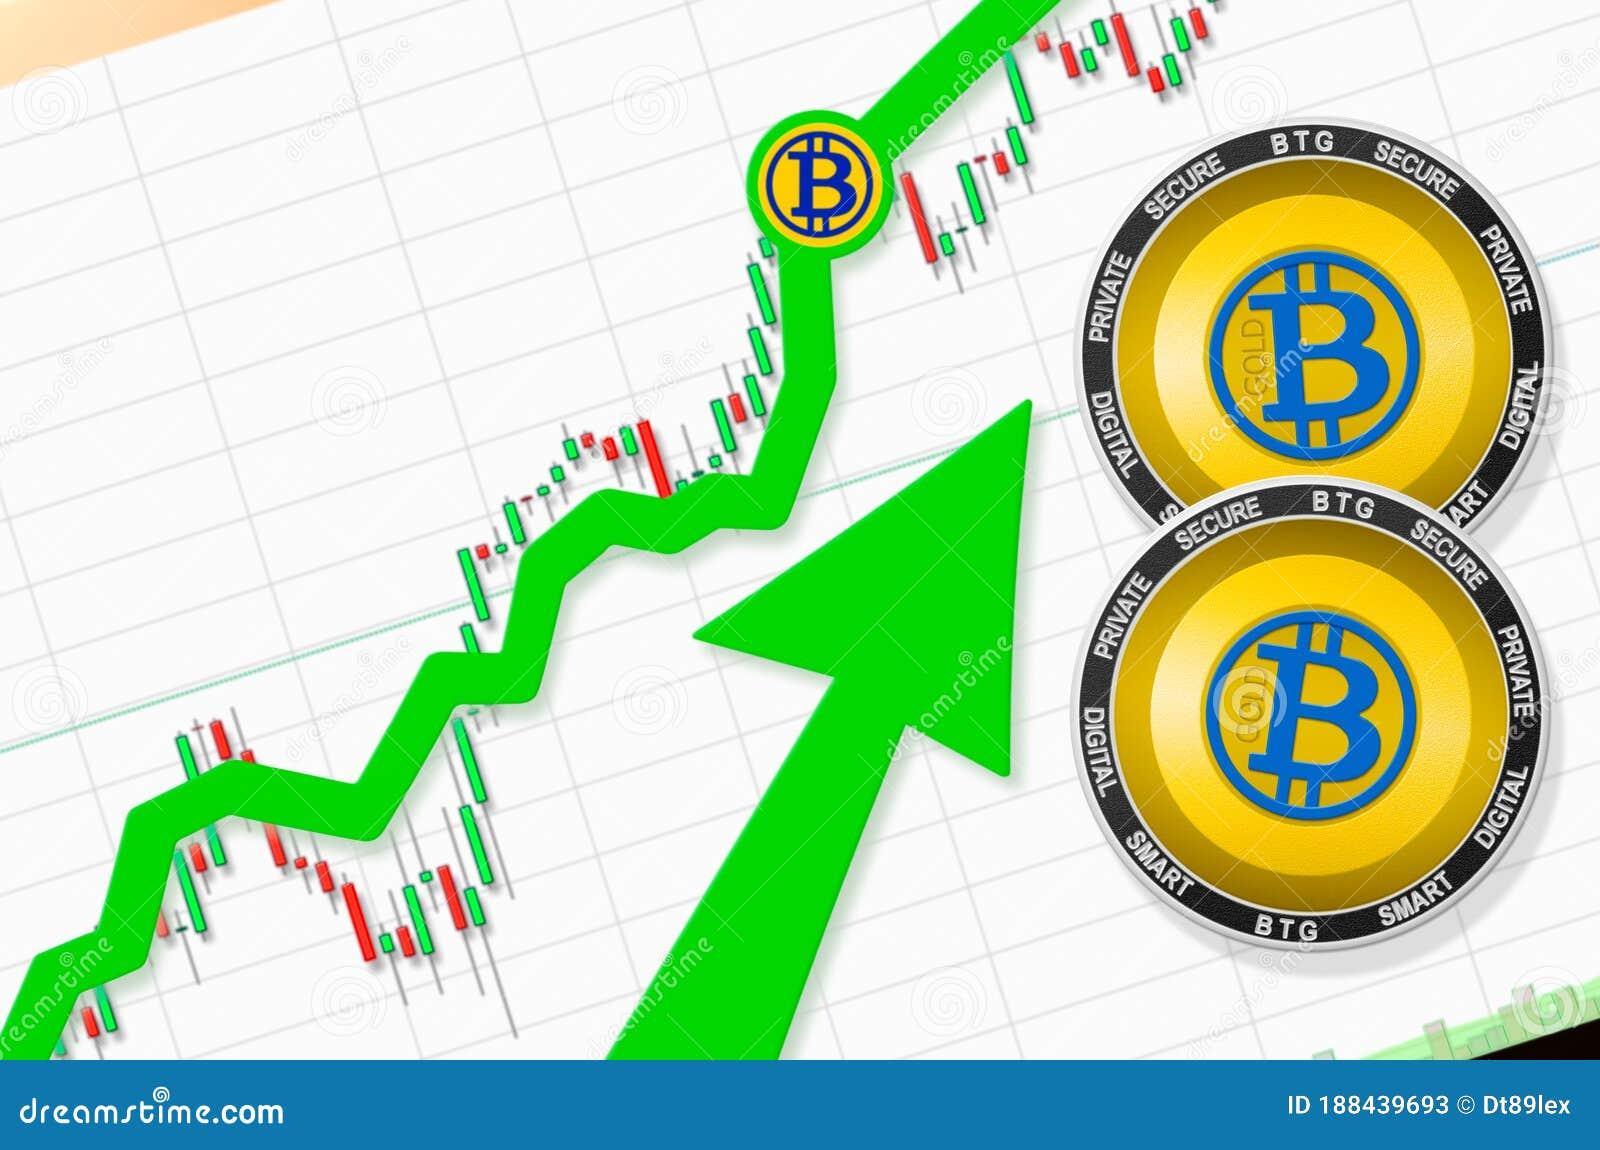 Compare NEM to Bitcoin Gold